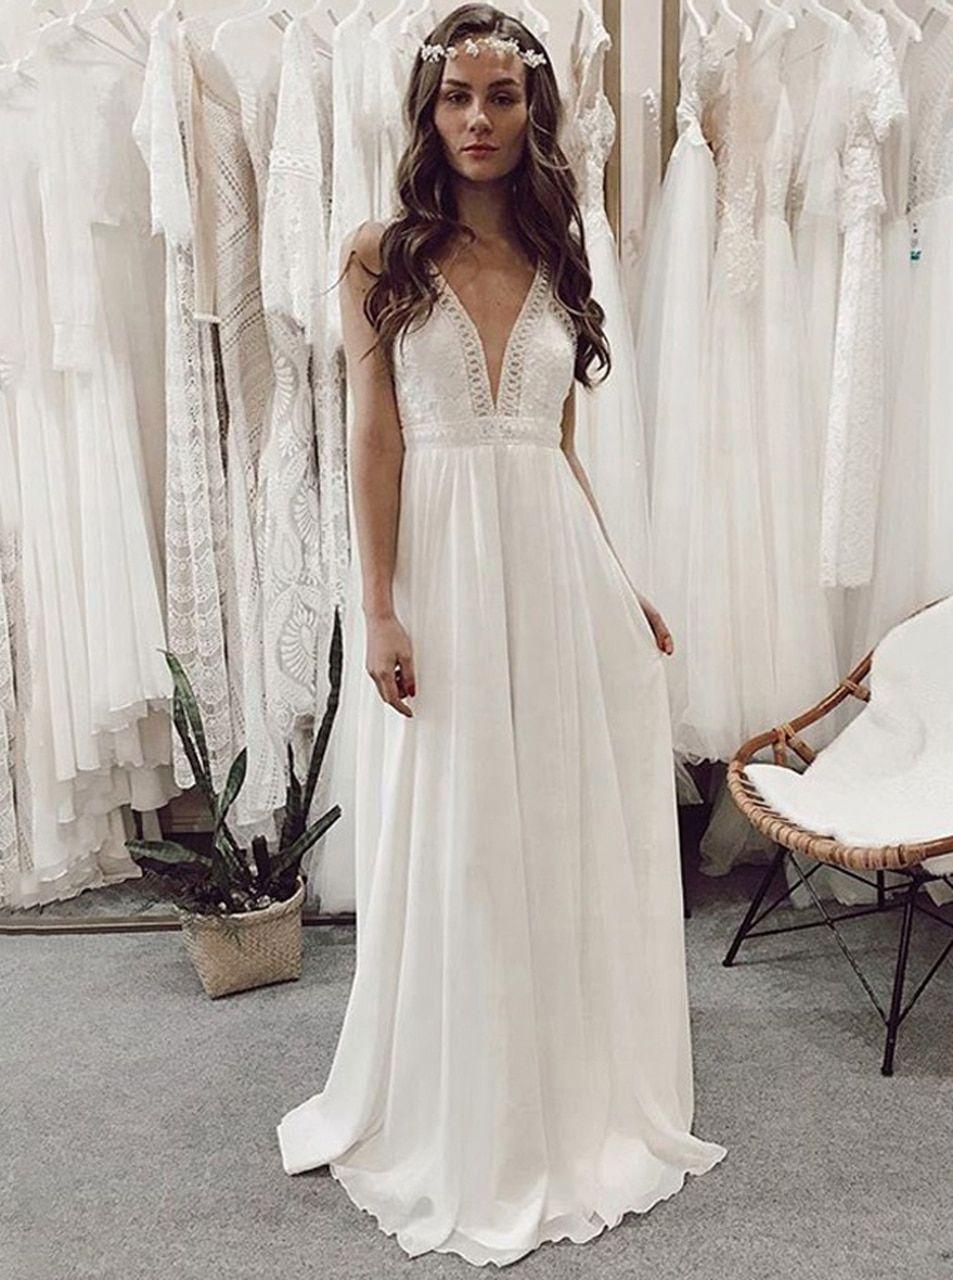 7 Prodigious Simple Wedding Dress Lace Fitted Jolting Ideas In 2021 Chiffon Wedding Dress Beach Wedding Dresses Vintage Lace Sleeves Beach Wedding Dress Boho [ 1280 x 953 Pixel ]